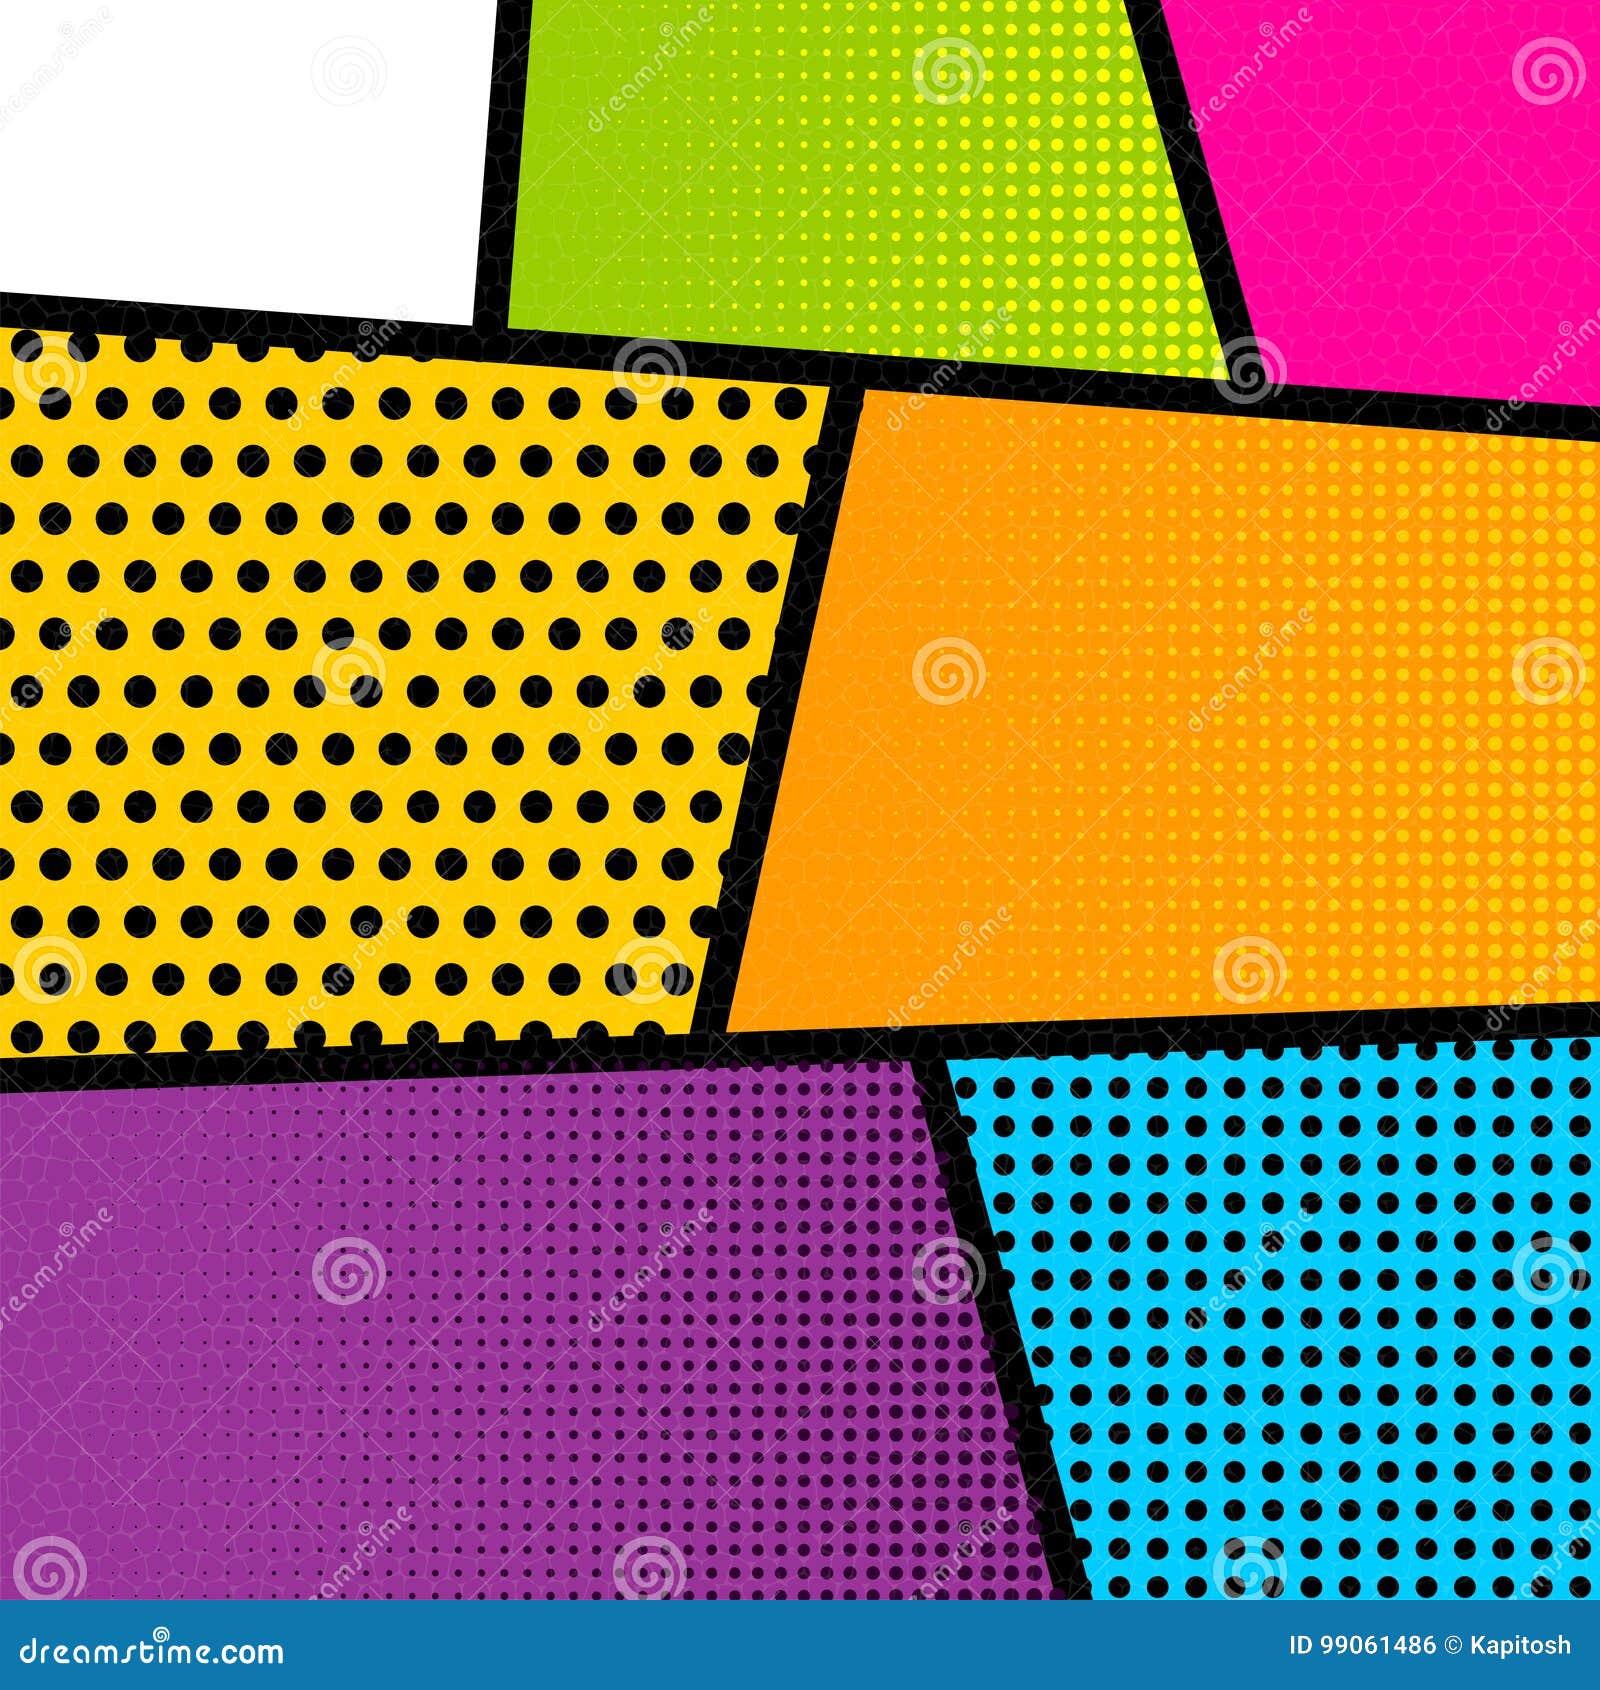 images?q=tbn:ANd9GcQh_l3eQ5xwiPy07kGEXjmjgmBKBRB7H2mRxCGhv1tFWg5c_mWT Awesome Pop Art Background Png @koolgadgetz.com.info